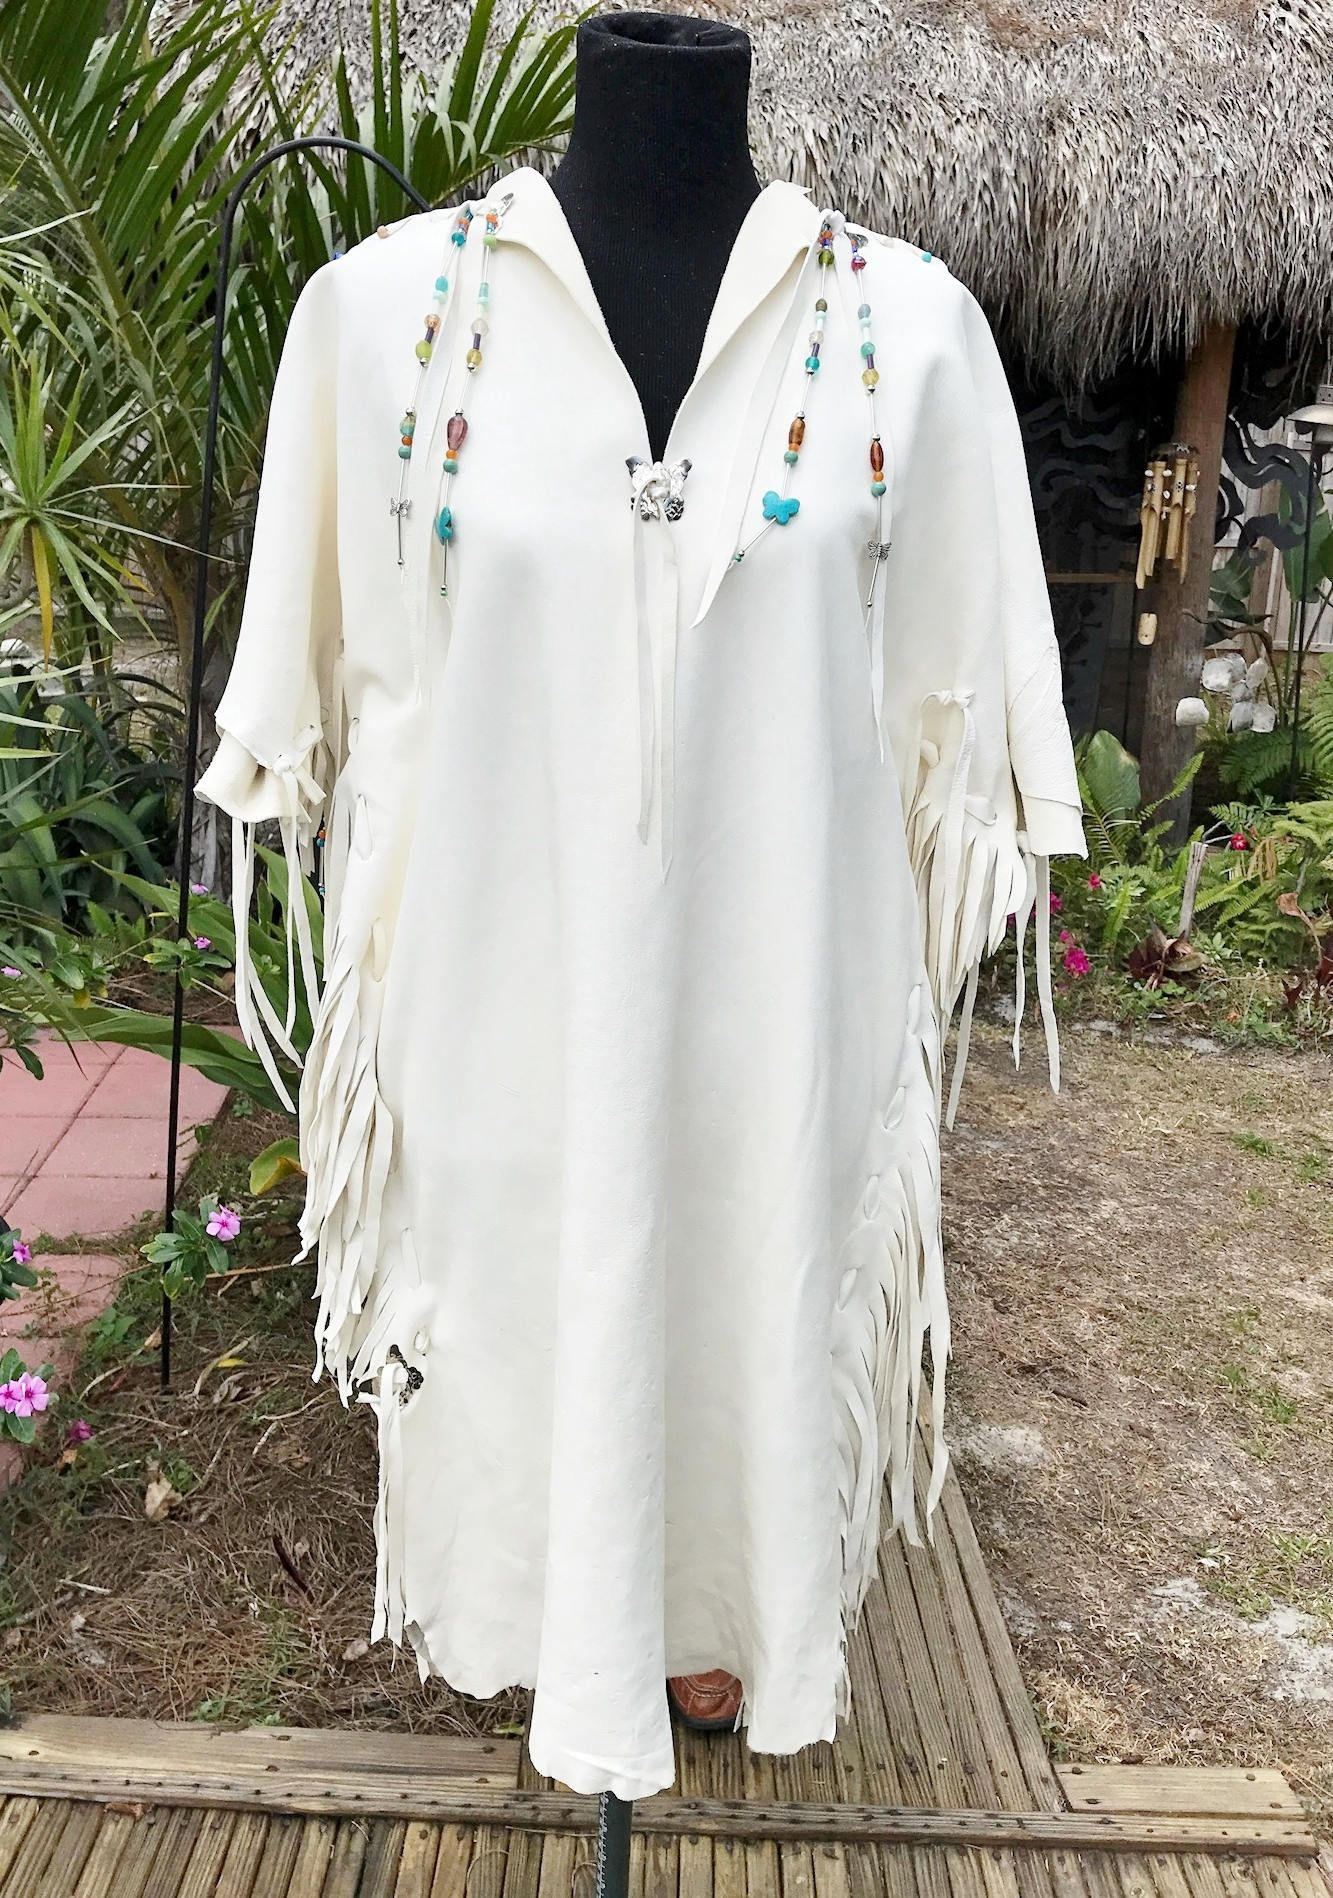 Native american wedding dress  White Deerskin Dress Native American Style Wedding Dress White